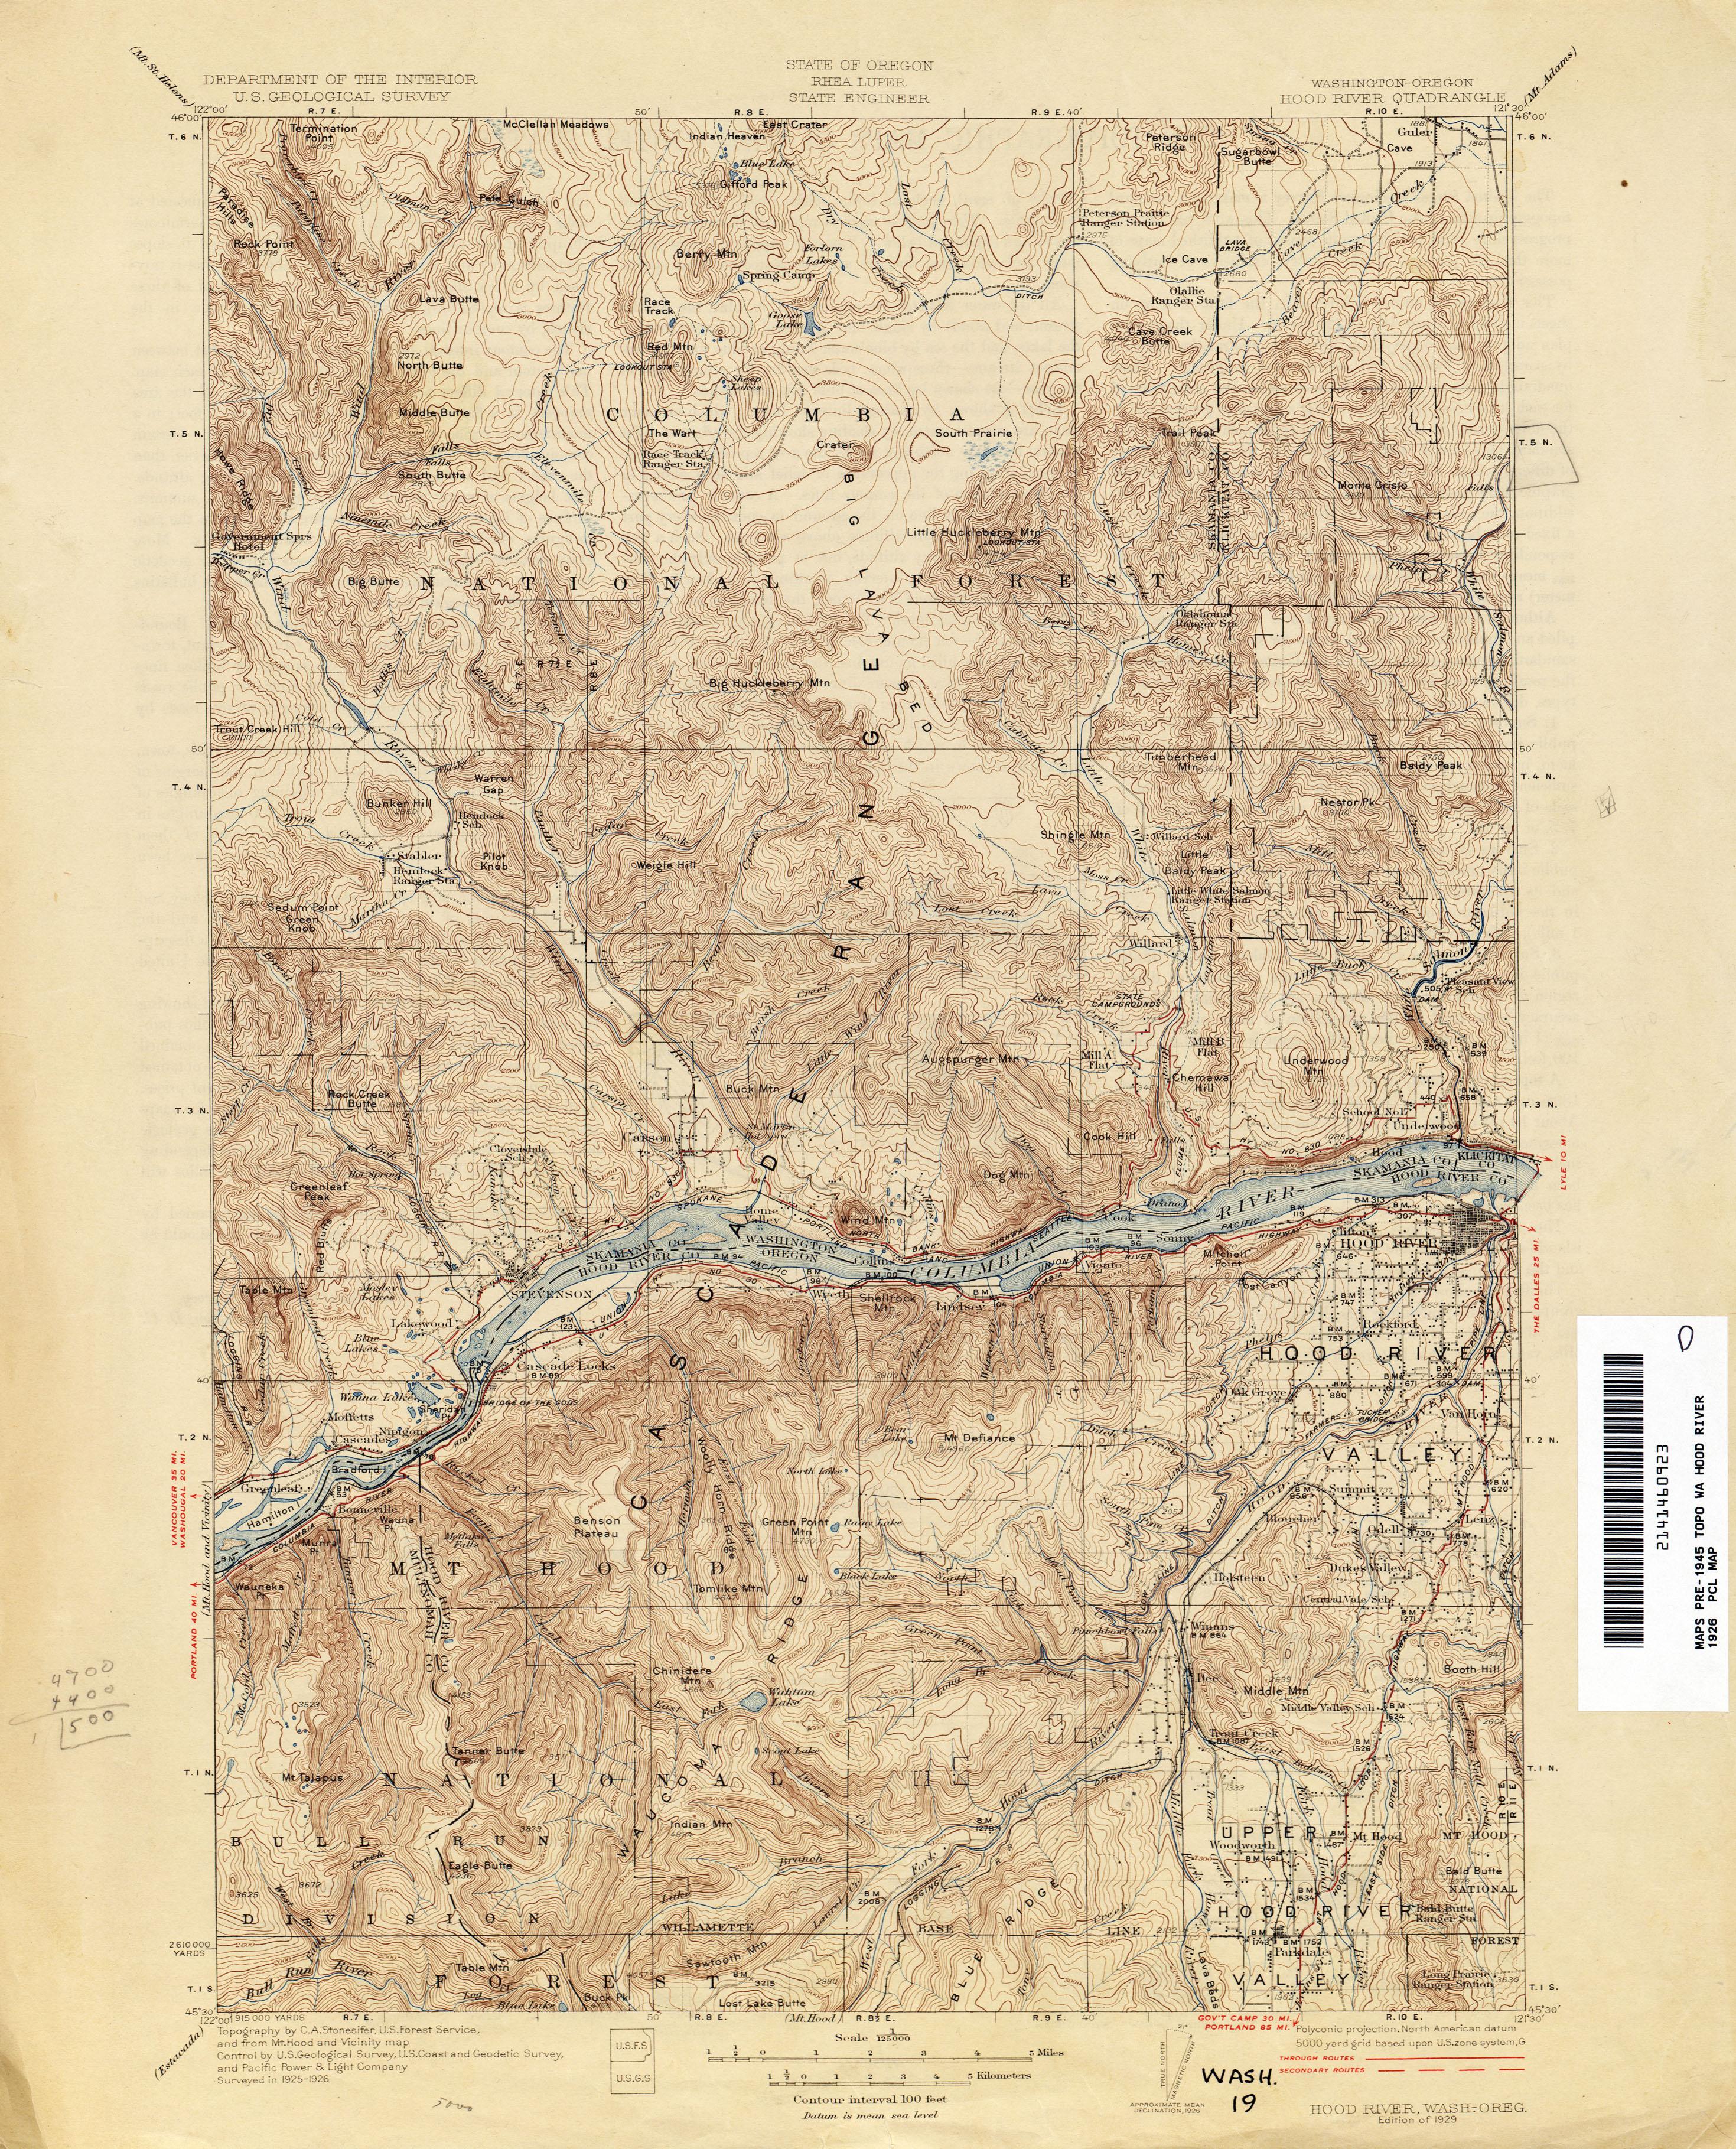 Topographic Map Washington Dc.Washington Historical Topographic Maps Perry Castaneda Map